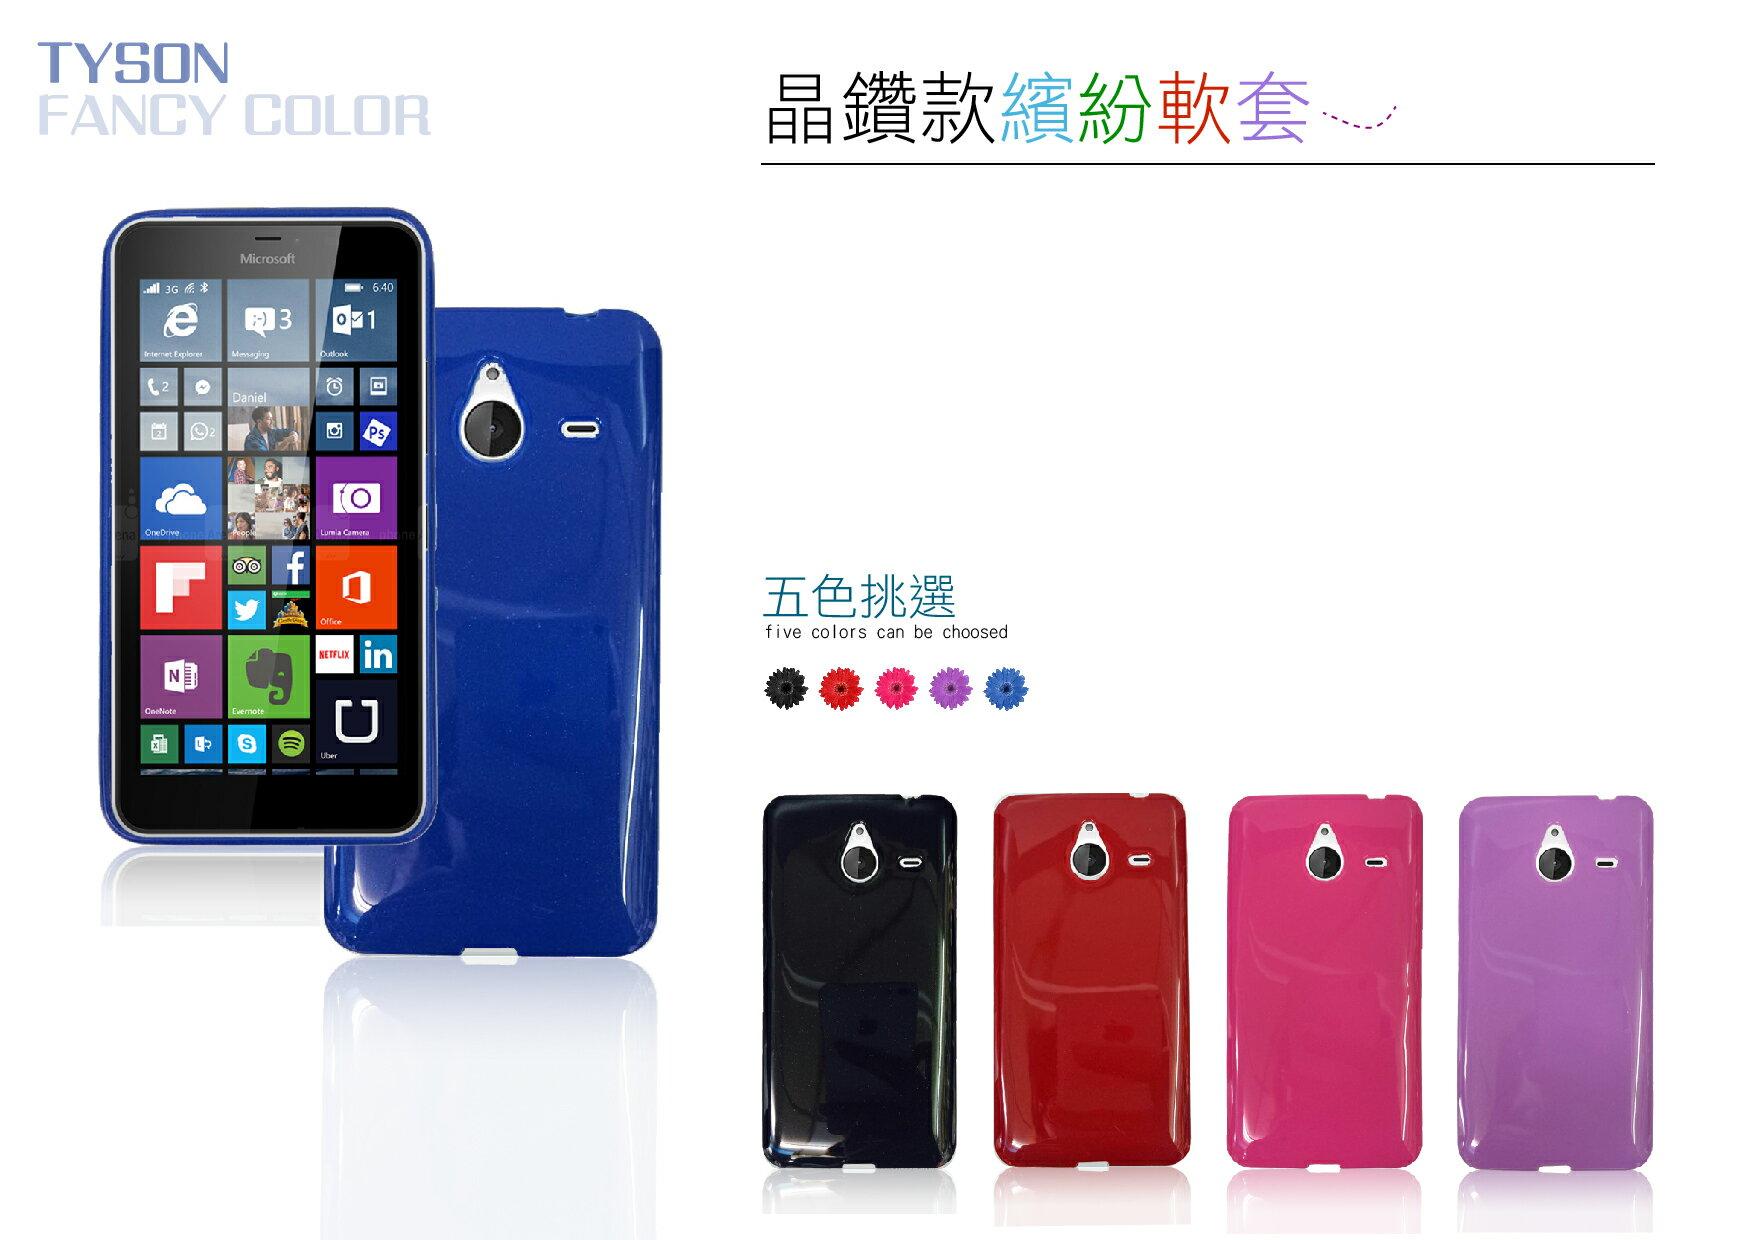 NOKIA MICROSOFT LUMIA 640 XL 繽紛晶鑽系列 保護殼 軟殼 手機套 背蓋